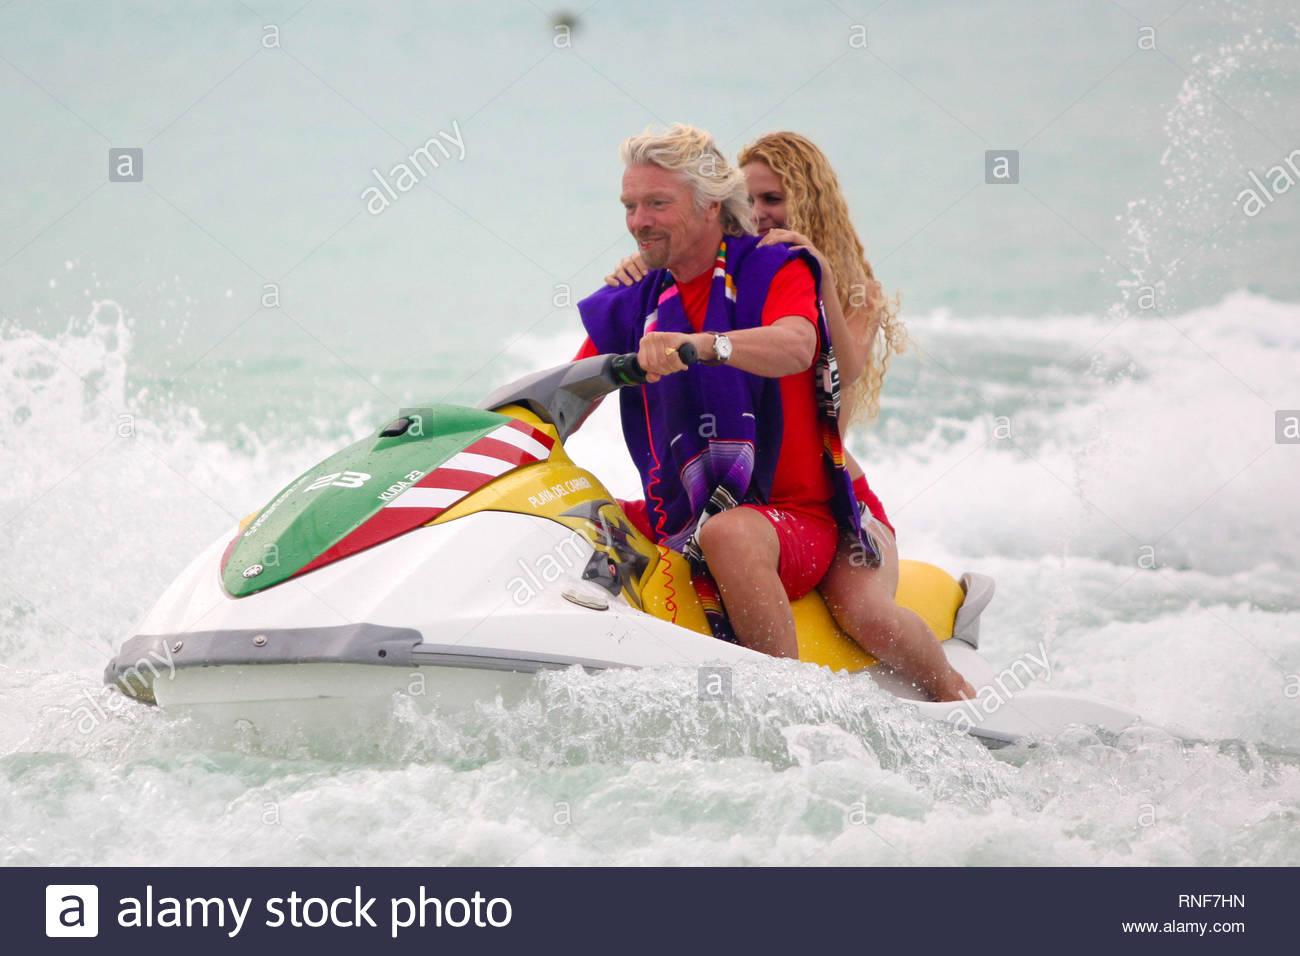 EXCLUSIVE* [USA ONLY] Playa del Carmen, Mexico - Sir Richard Branson